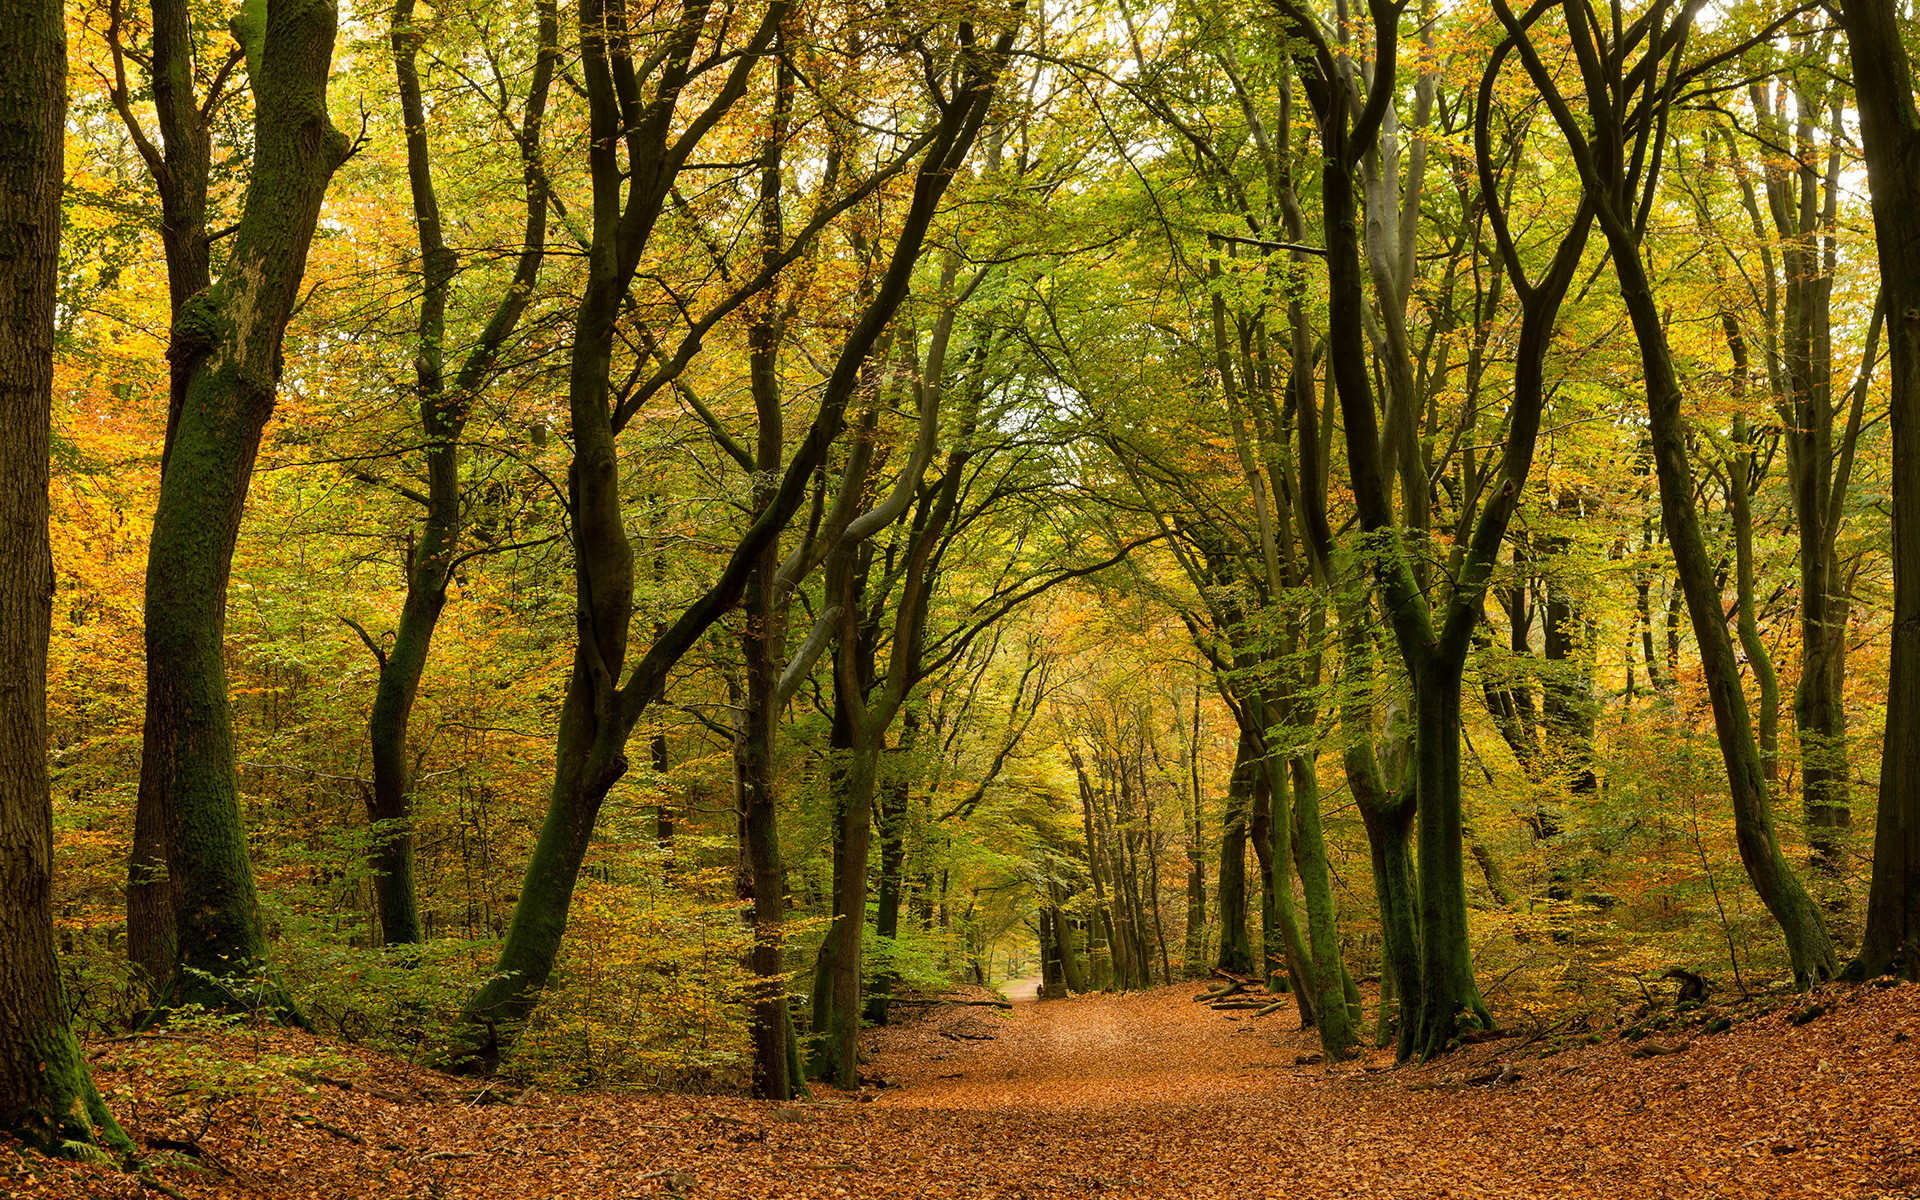 осенний лес фото картинки на рабочий стол что